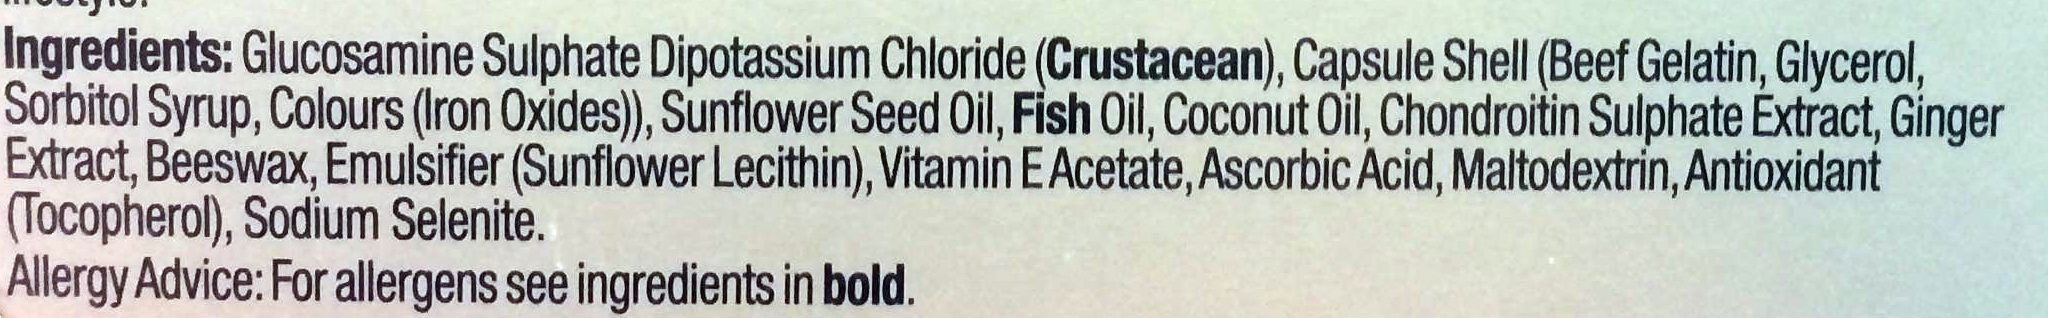 JOINTASSURE - Glucosamine, Chondroitin, Ginger - Ingredients - en